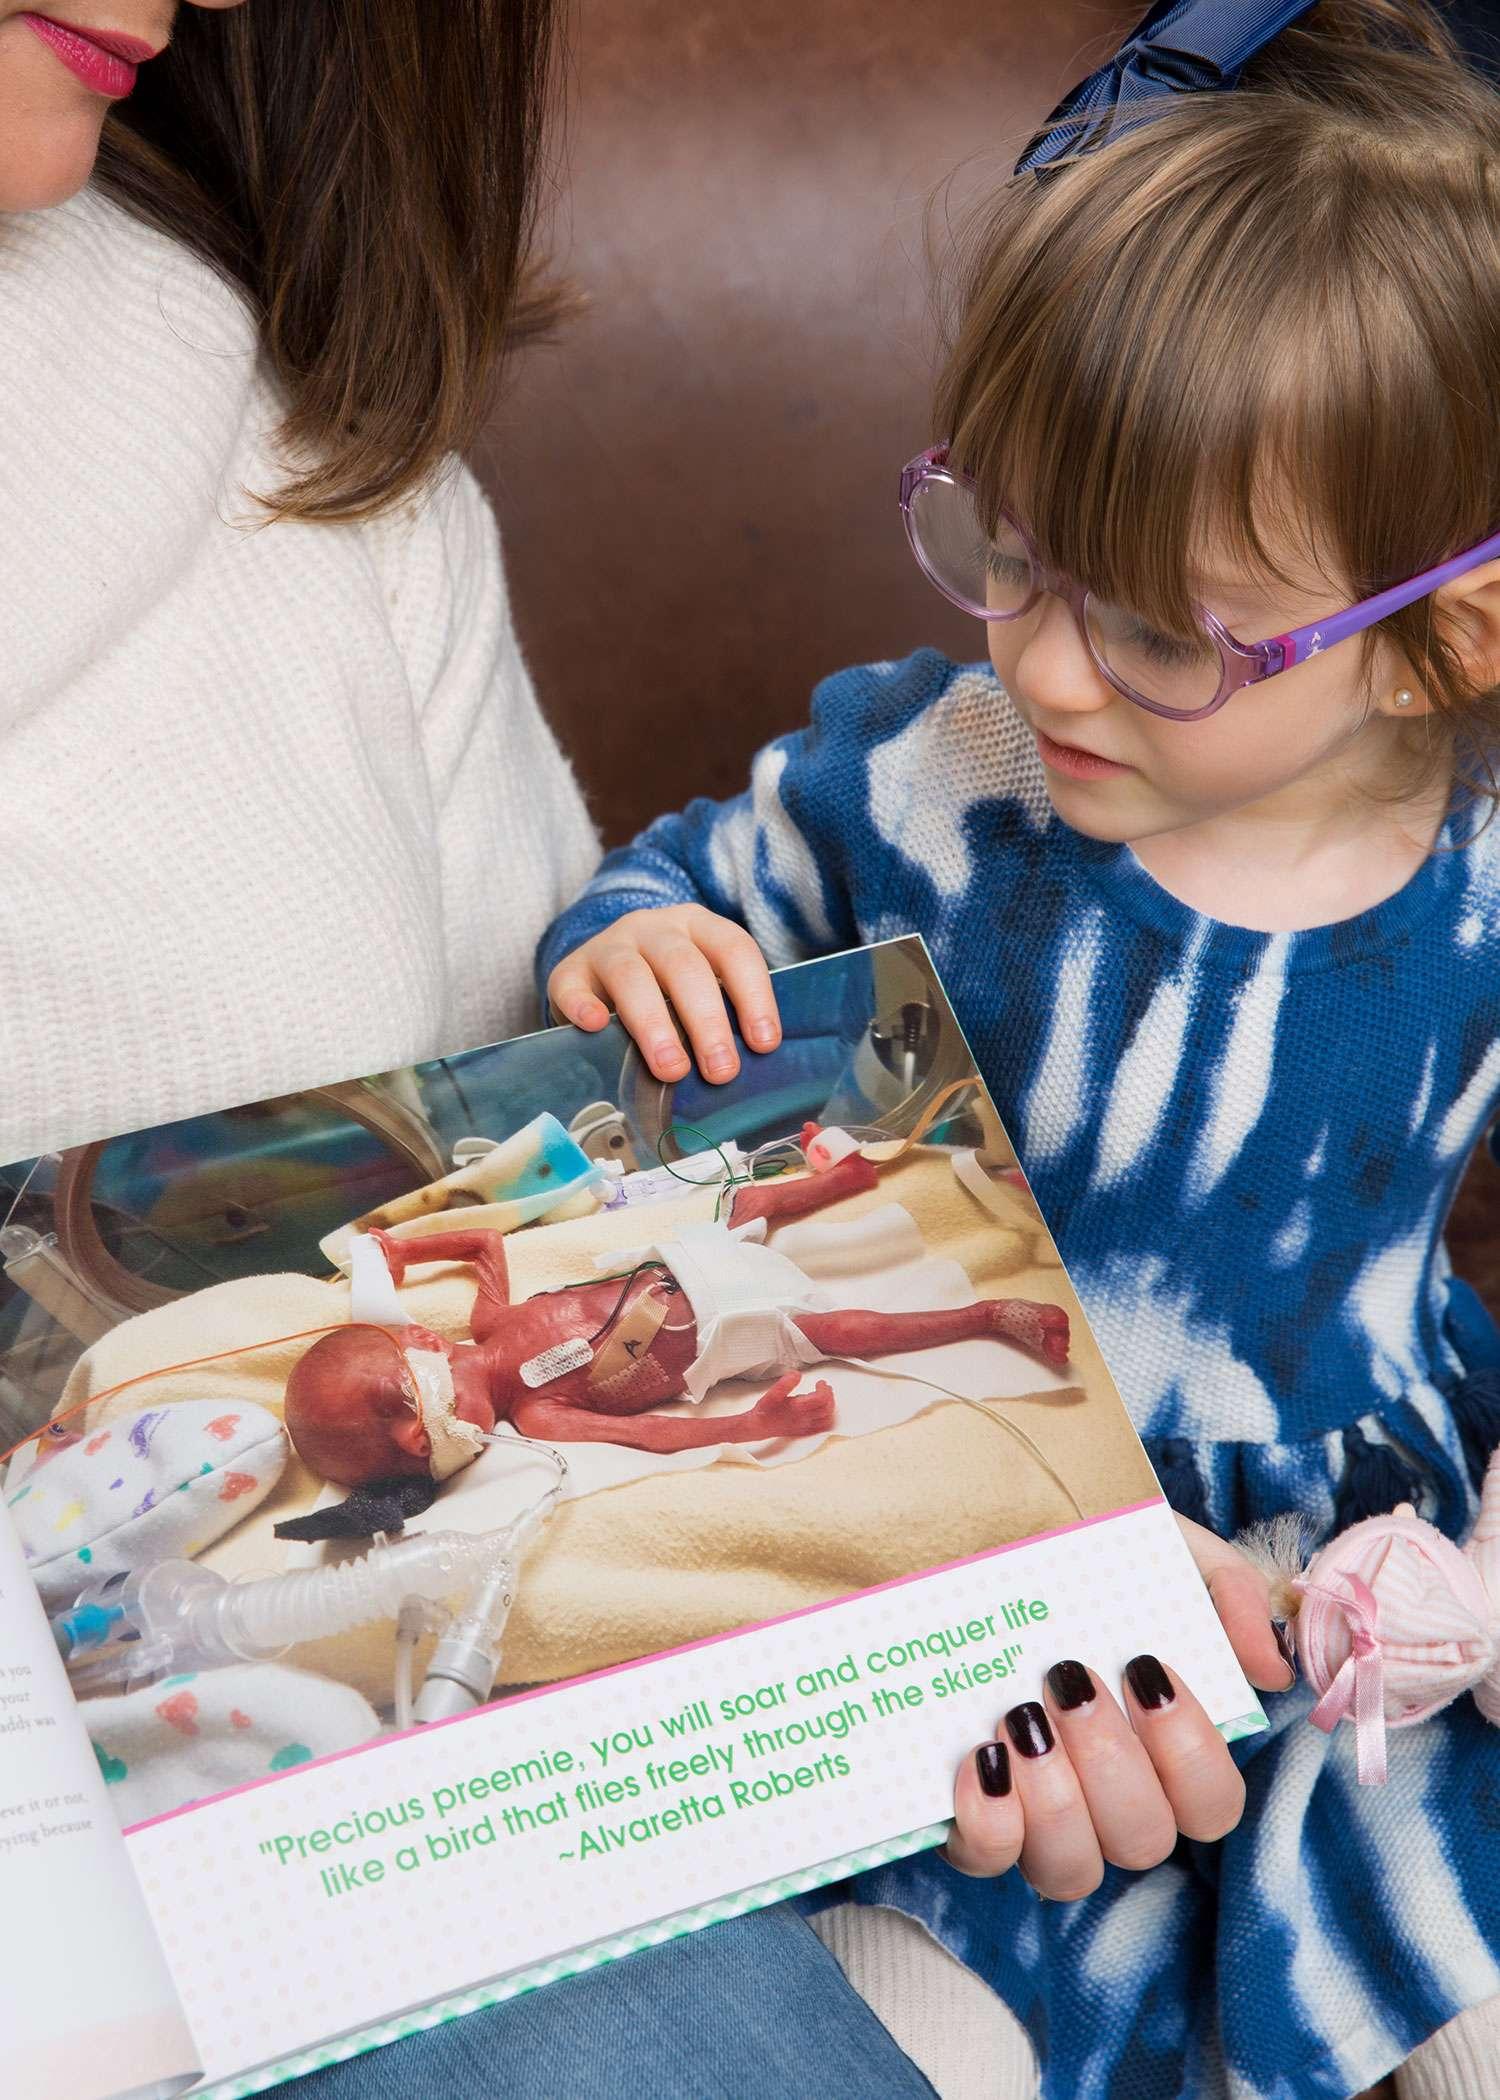 Lana looking at her preemie photos